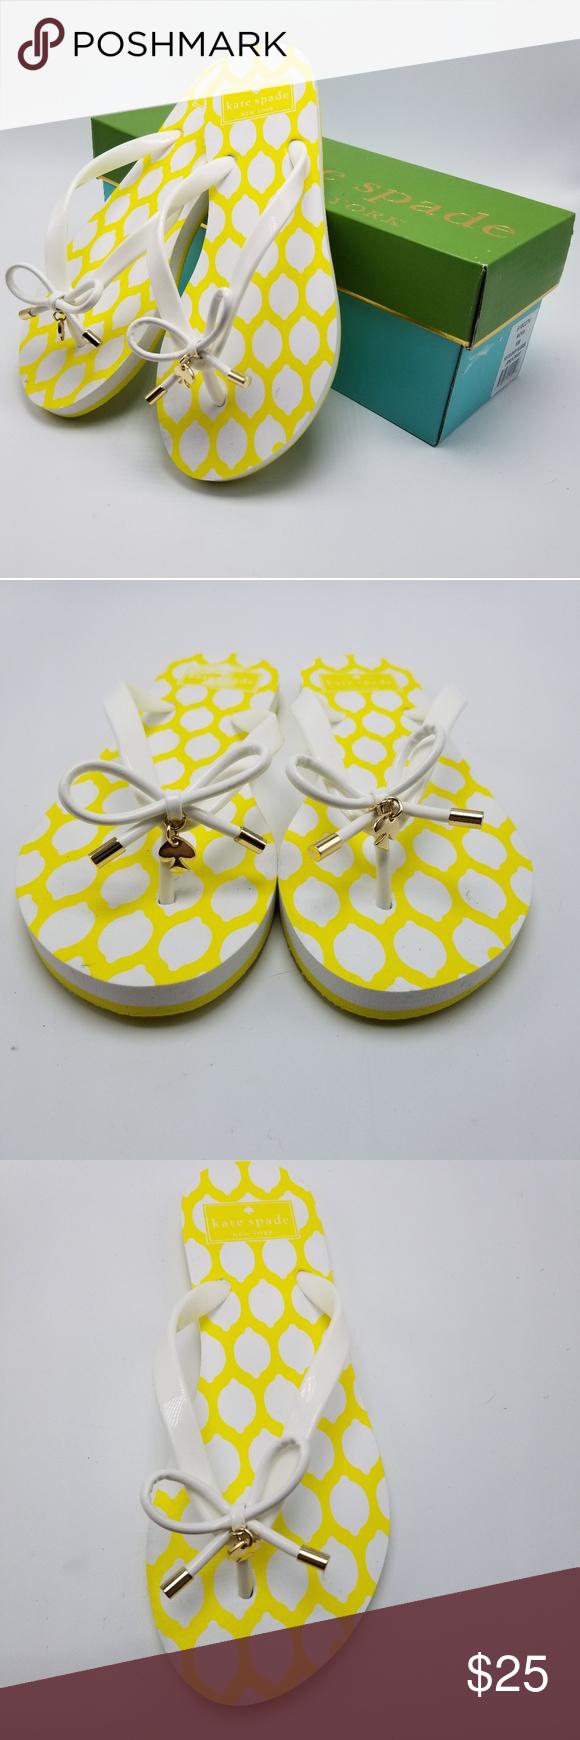 06bb43b537d NIB Kate Spade Nova Flip Flops Lemon Print Sandals NIB Kate Spade Nova Flip  Flops Lemon